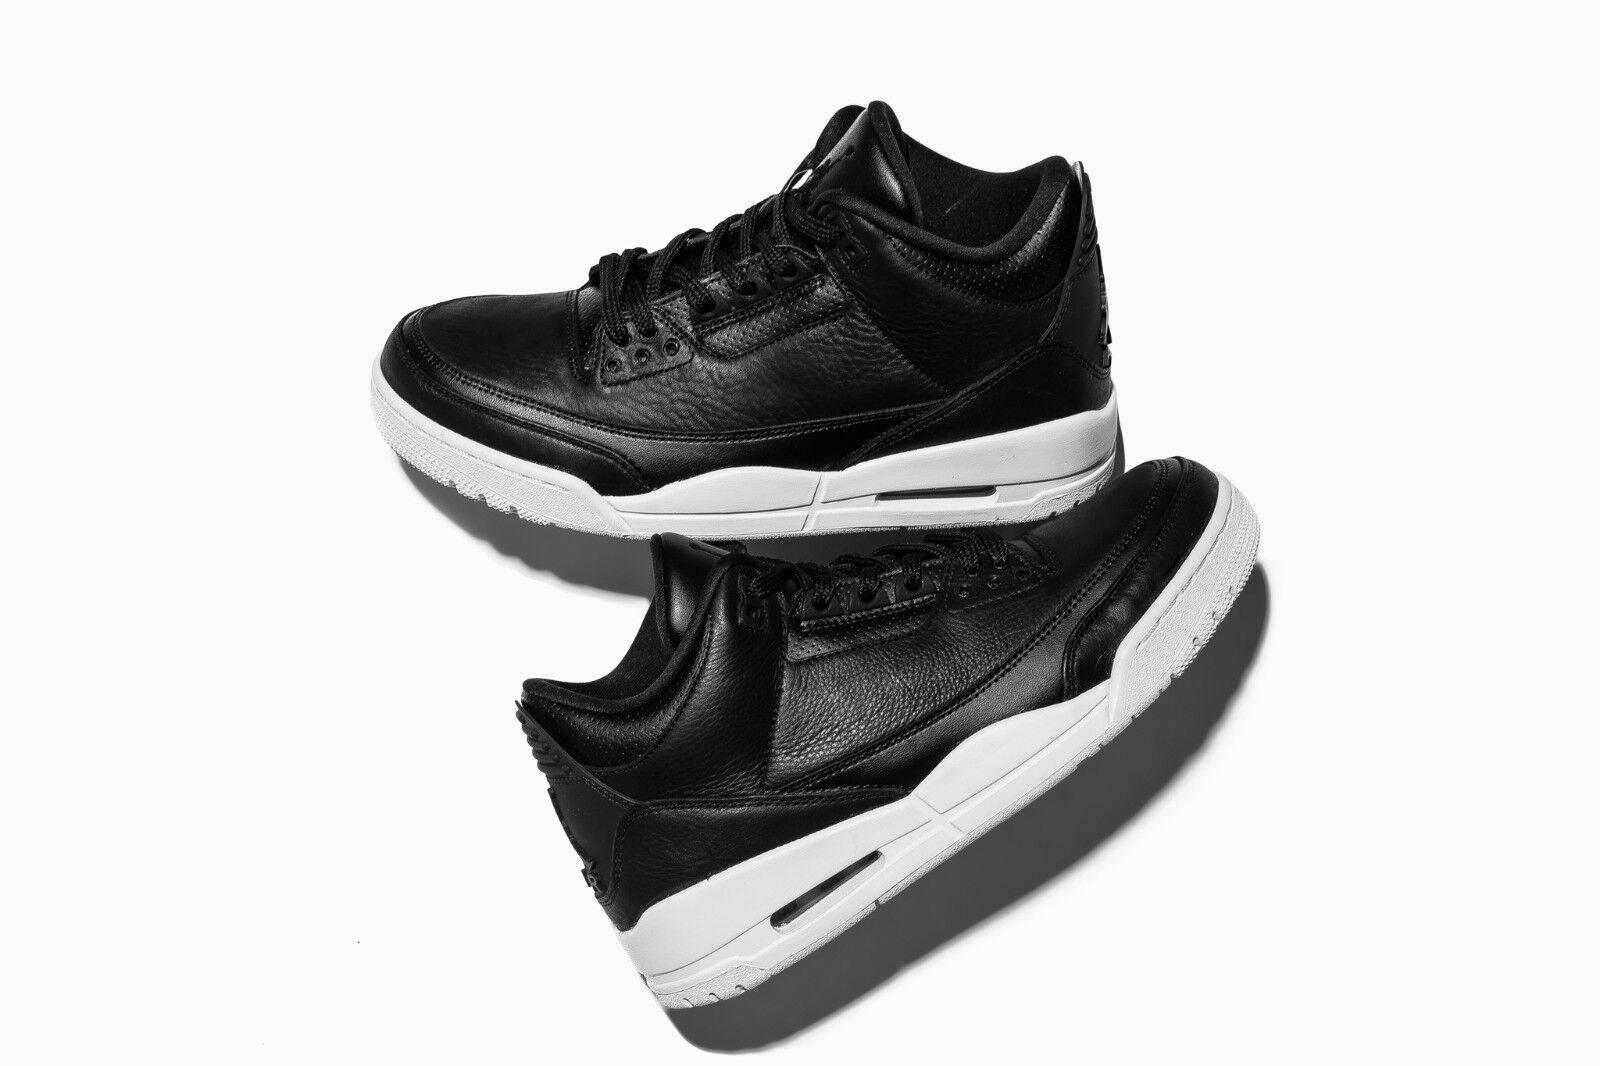 2016 Air Jordan 3 III Retro Cyber Monday SZ 9 Black Black White 136064-020